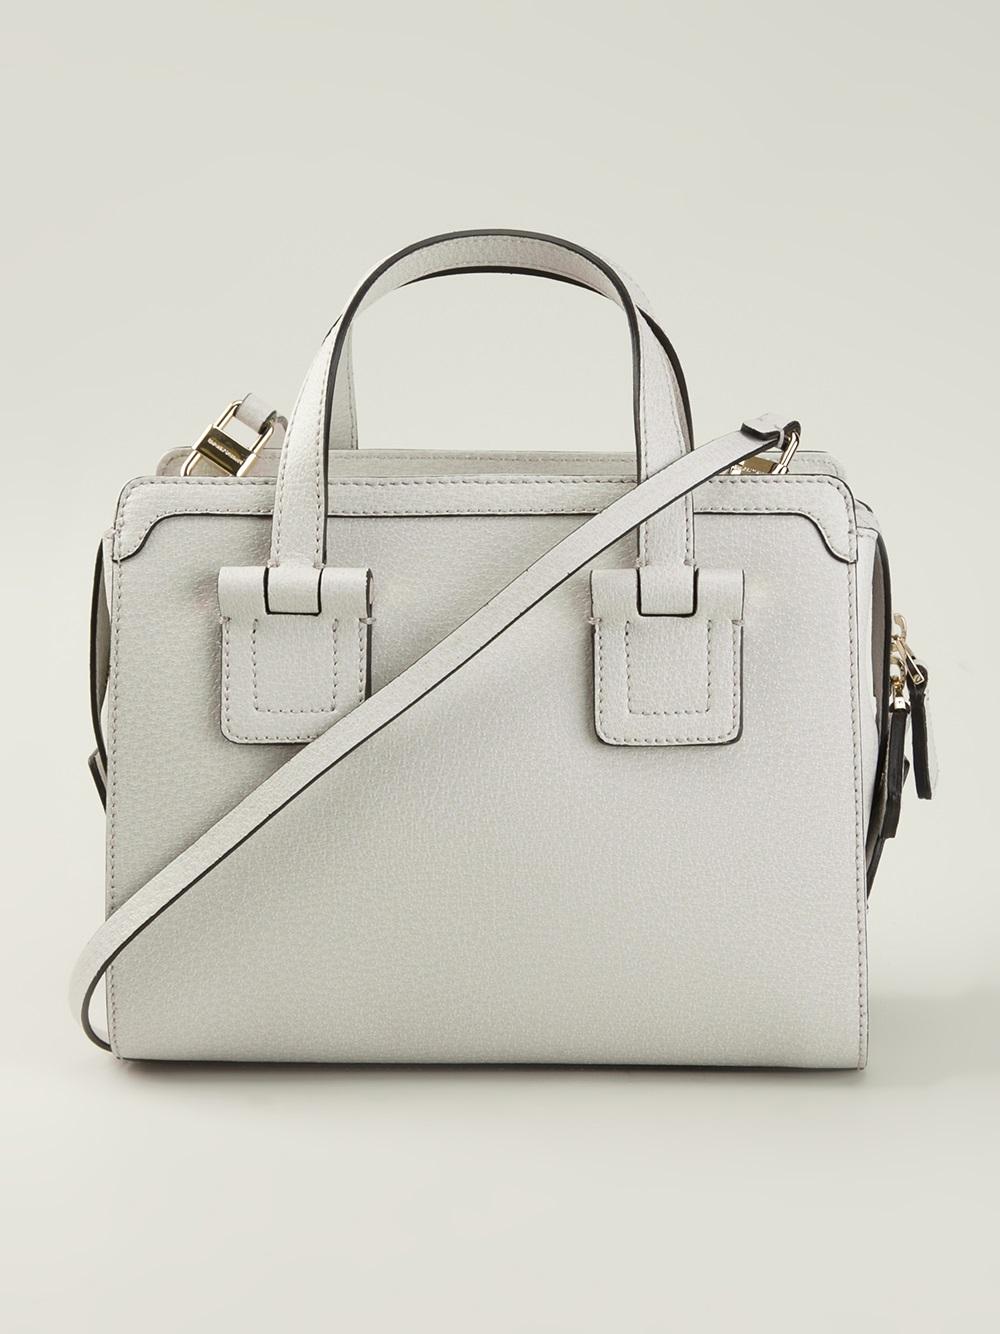 d76ae0aec36ee Lyst - Emporio Armani Mini Bowling Bag in Gray